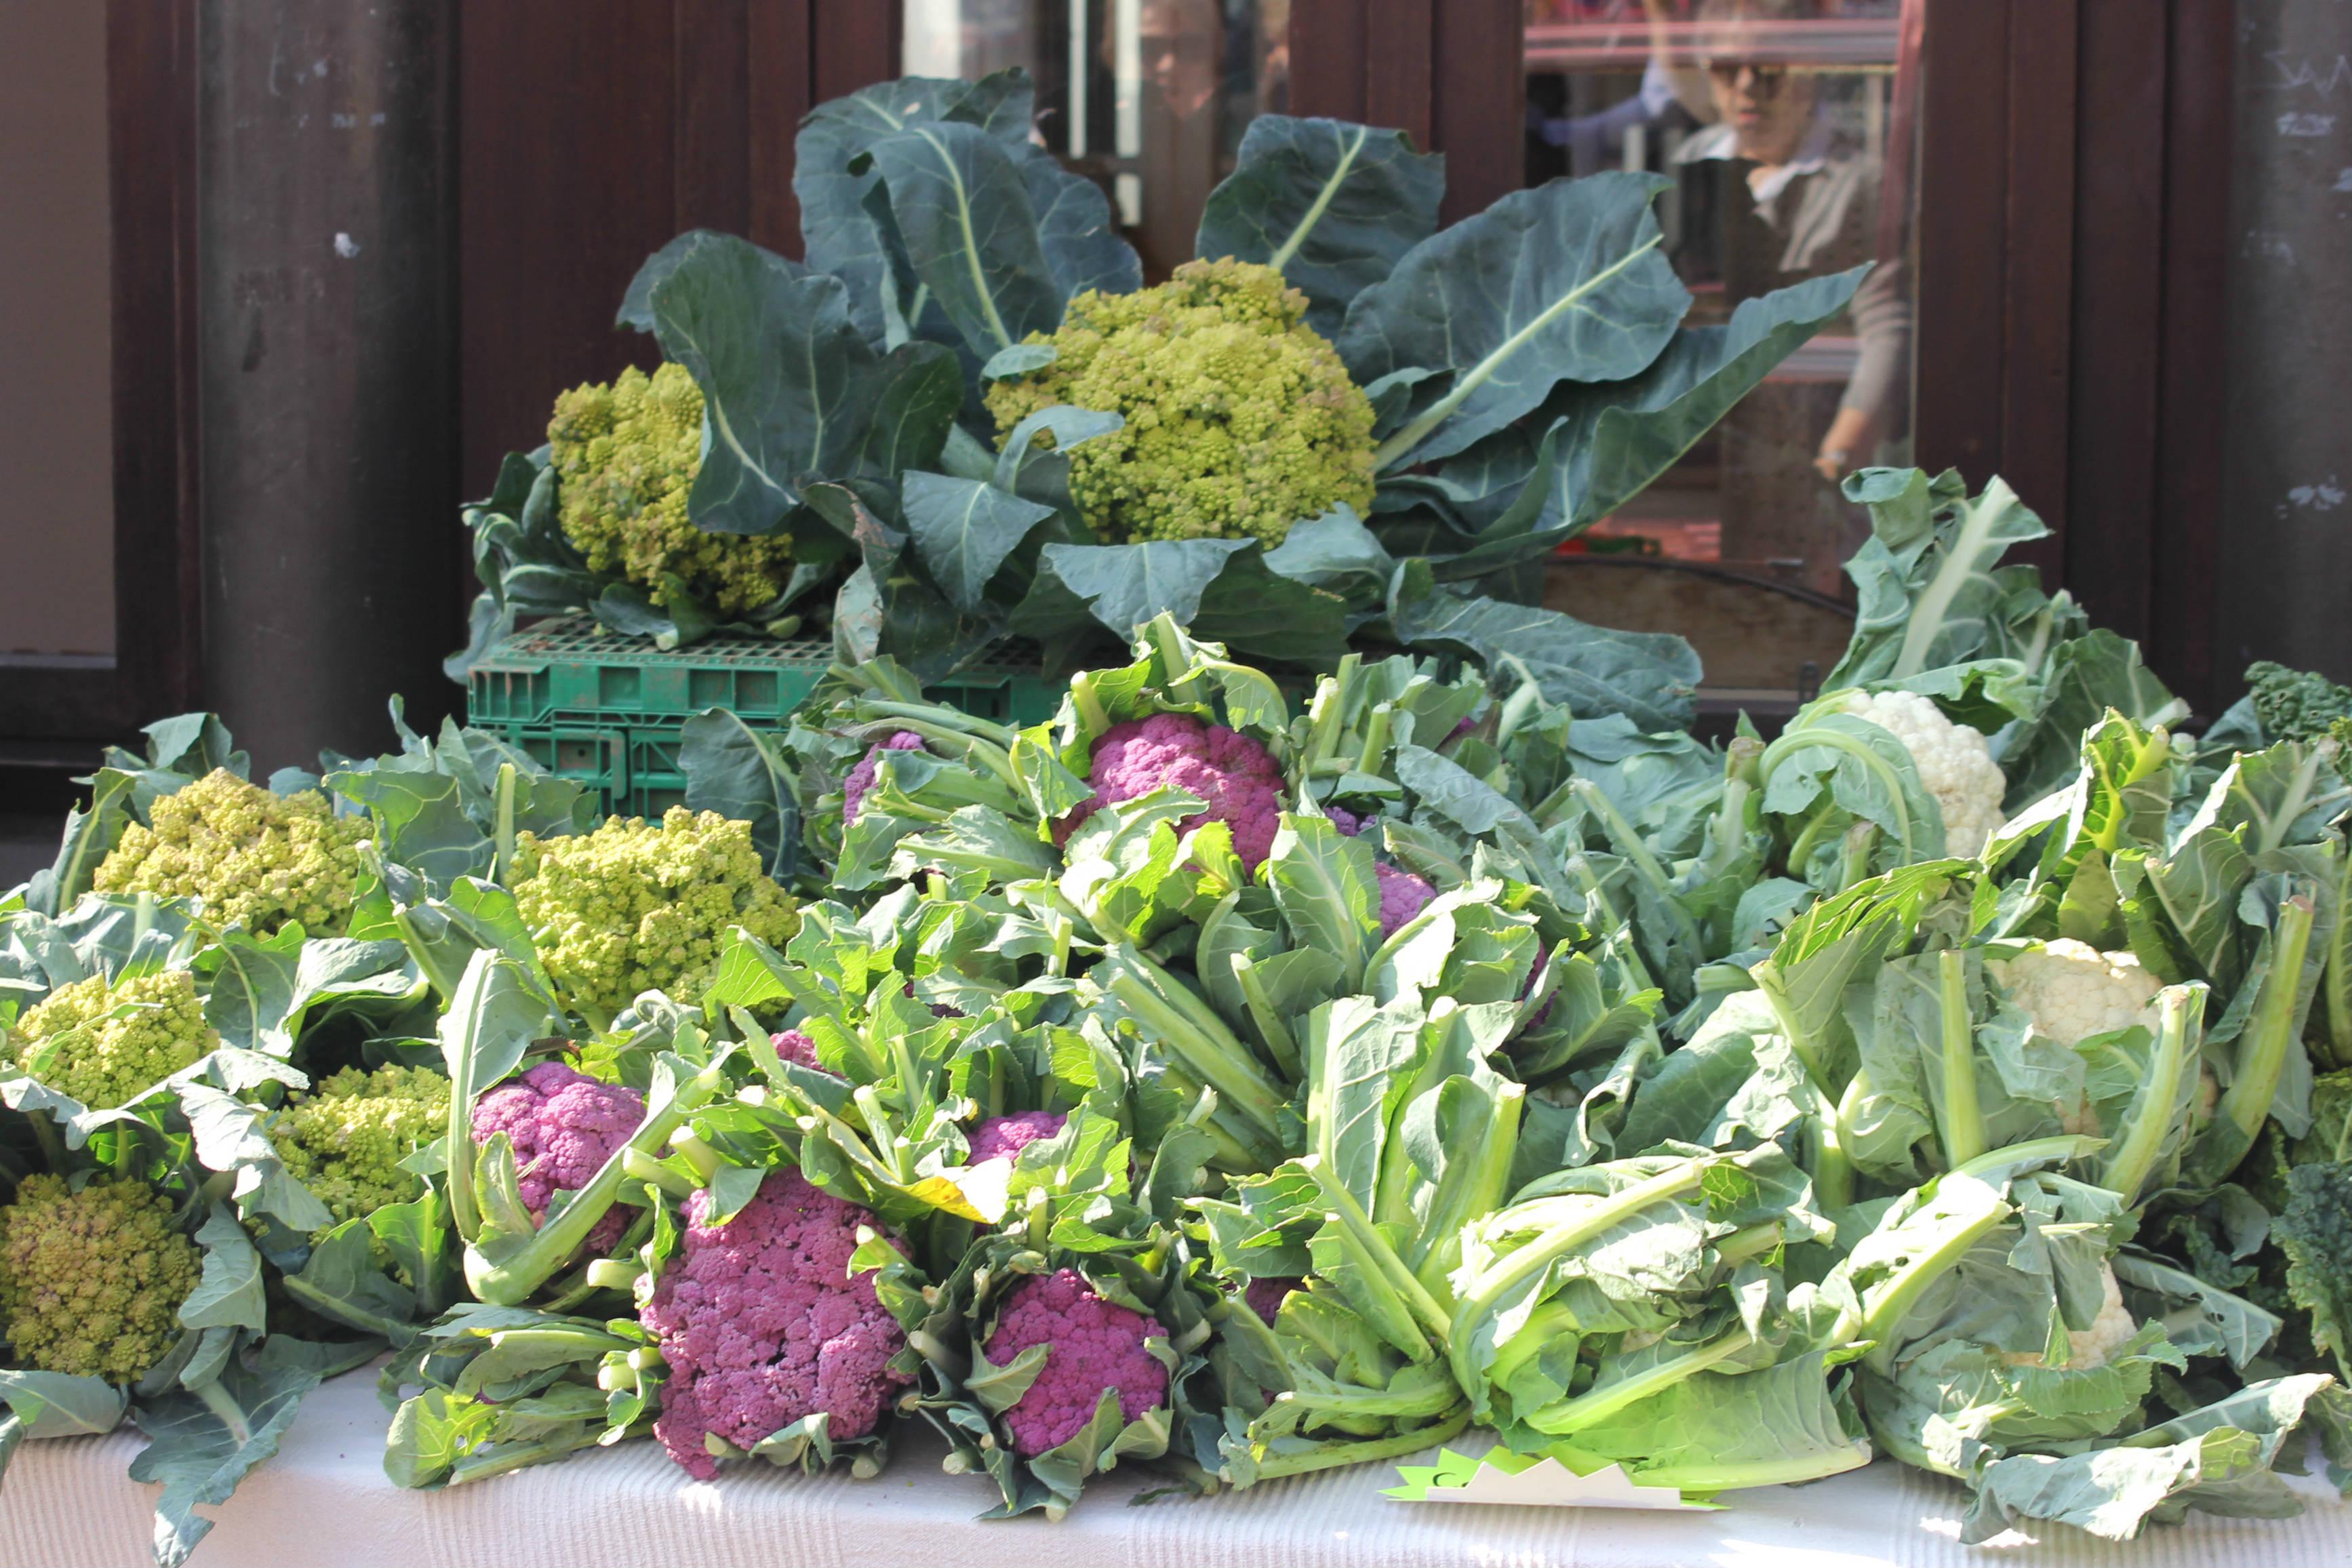 Paul's Organic Veg